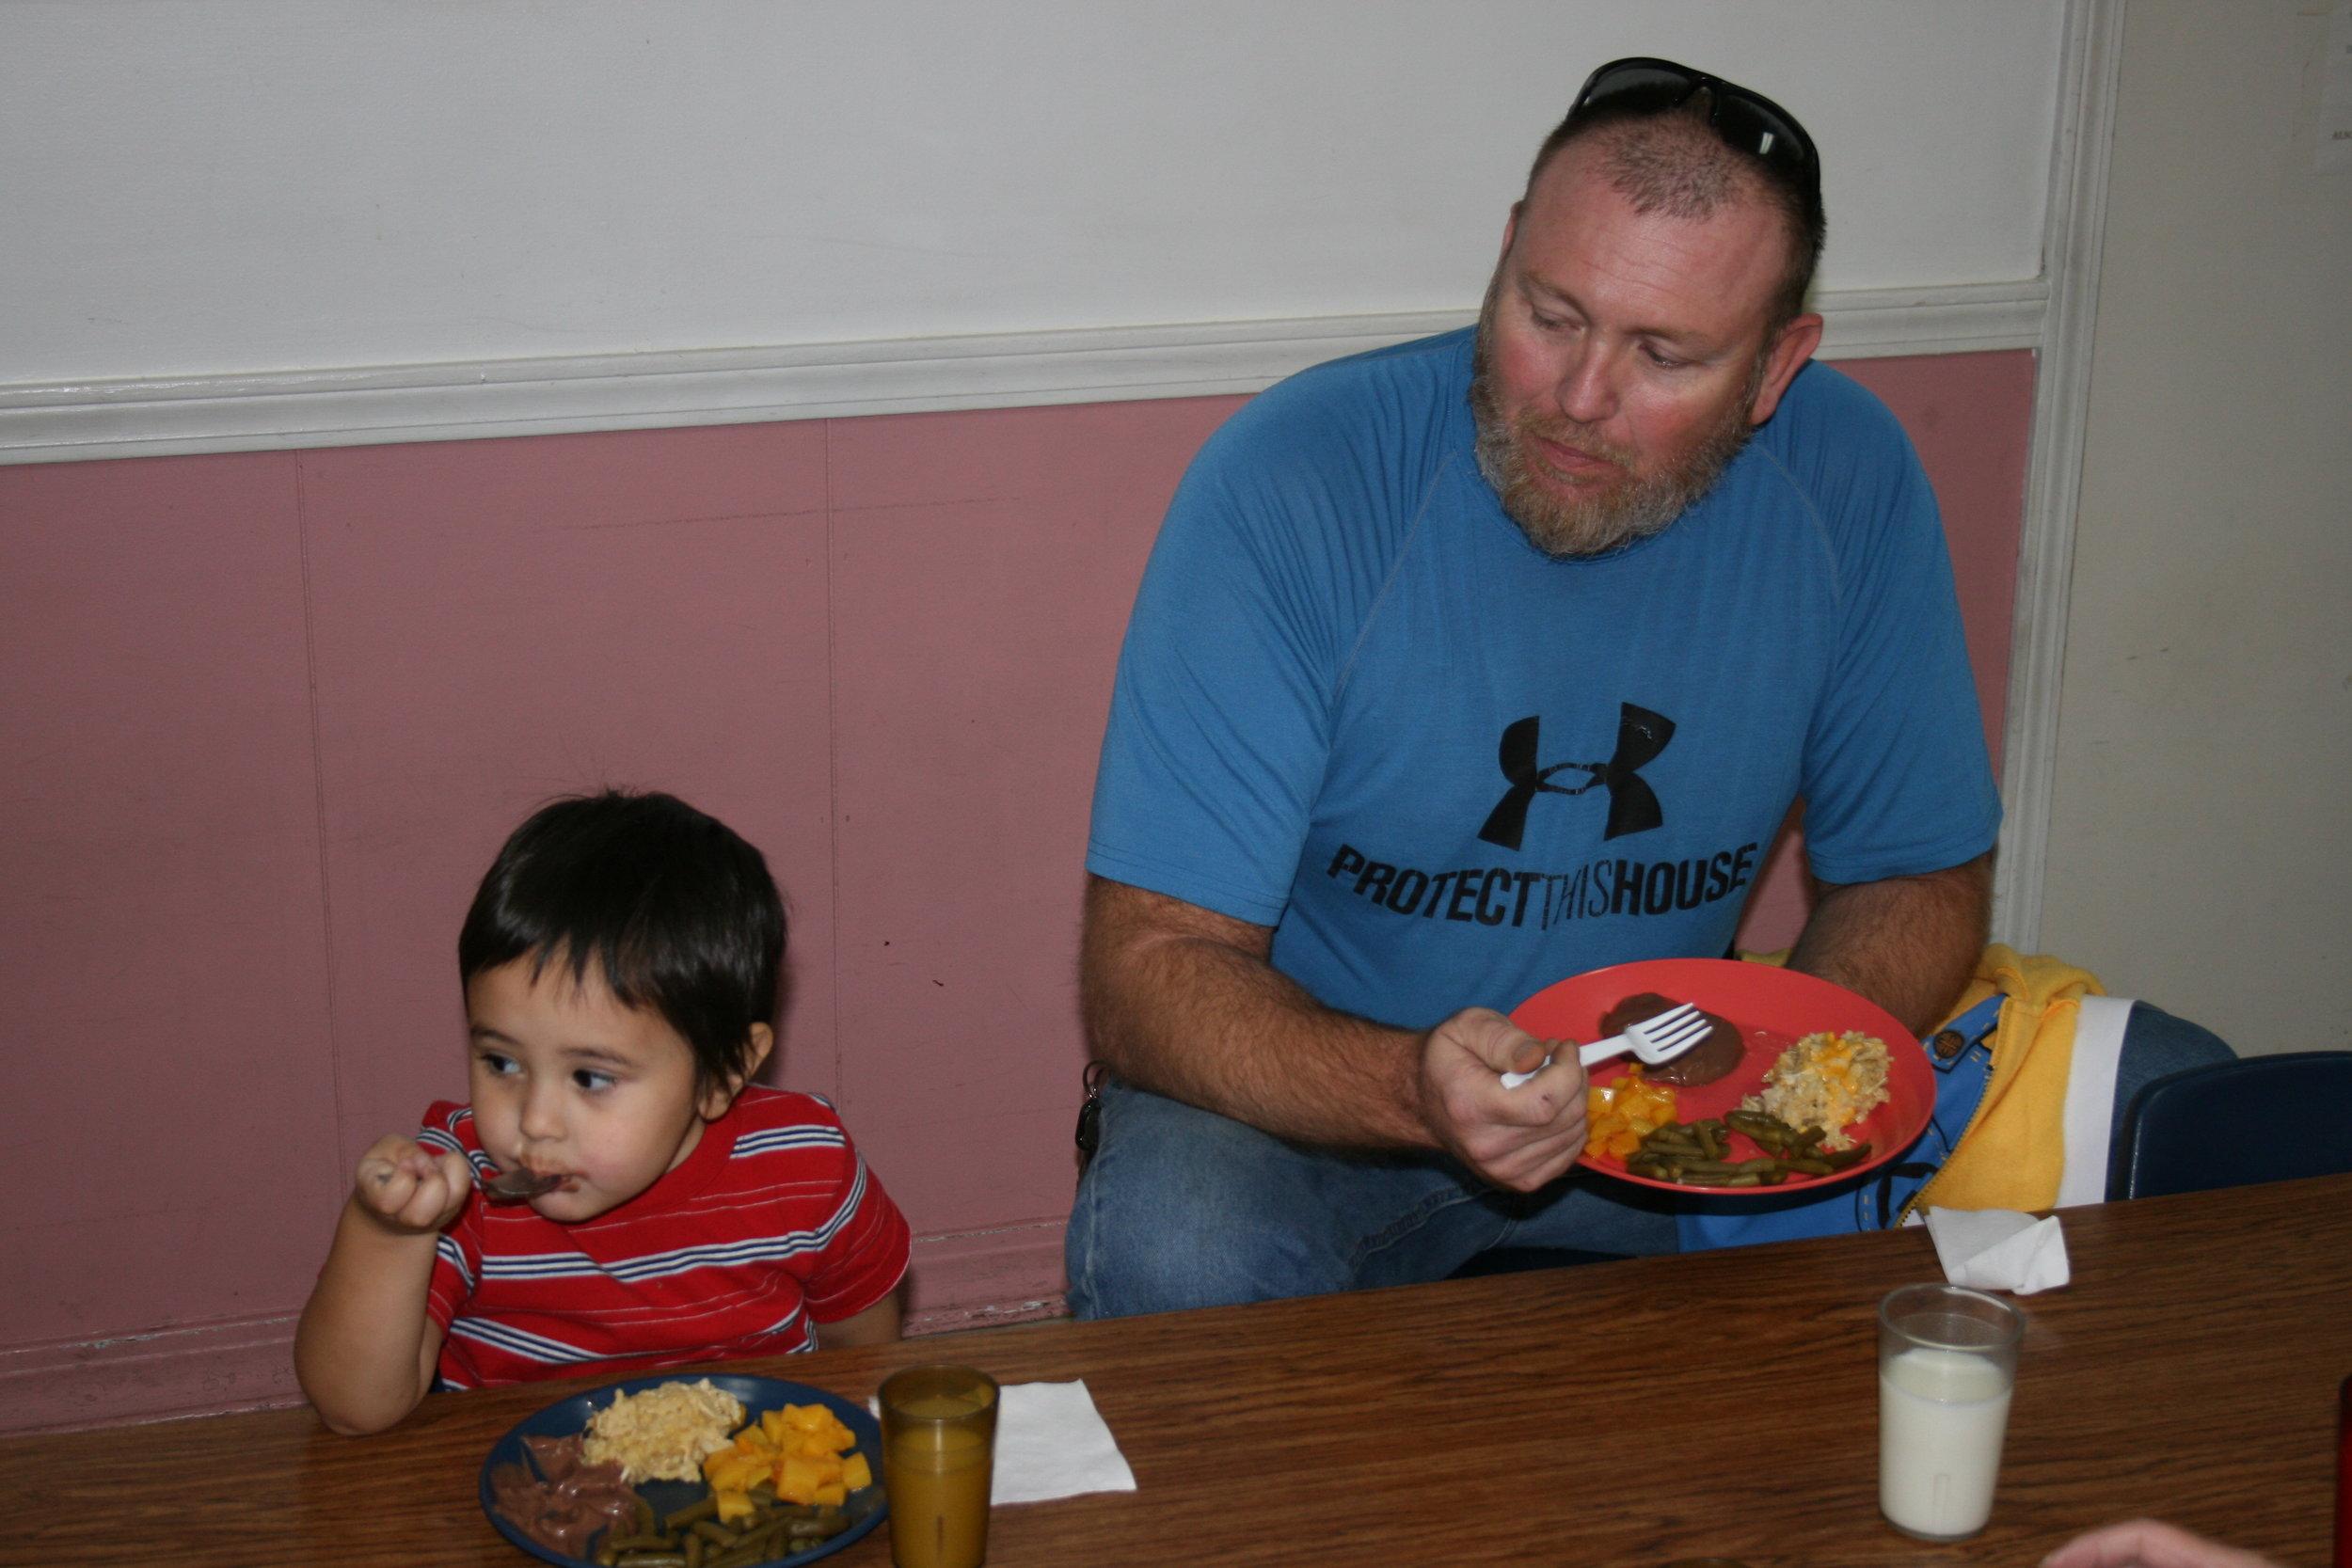 grandparents lunch 9-8-17 015.JPG